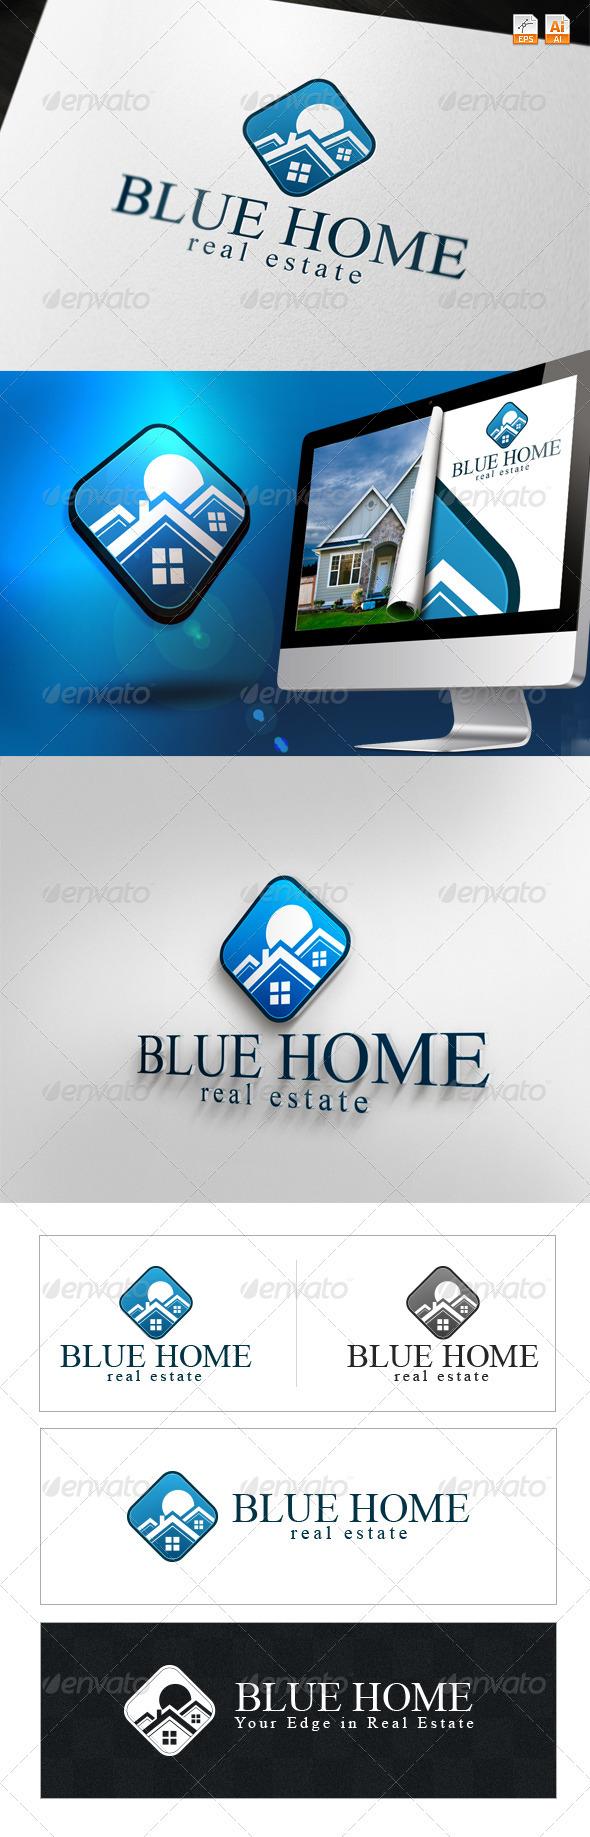 Blue Home - Real Estate Logo